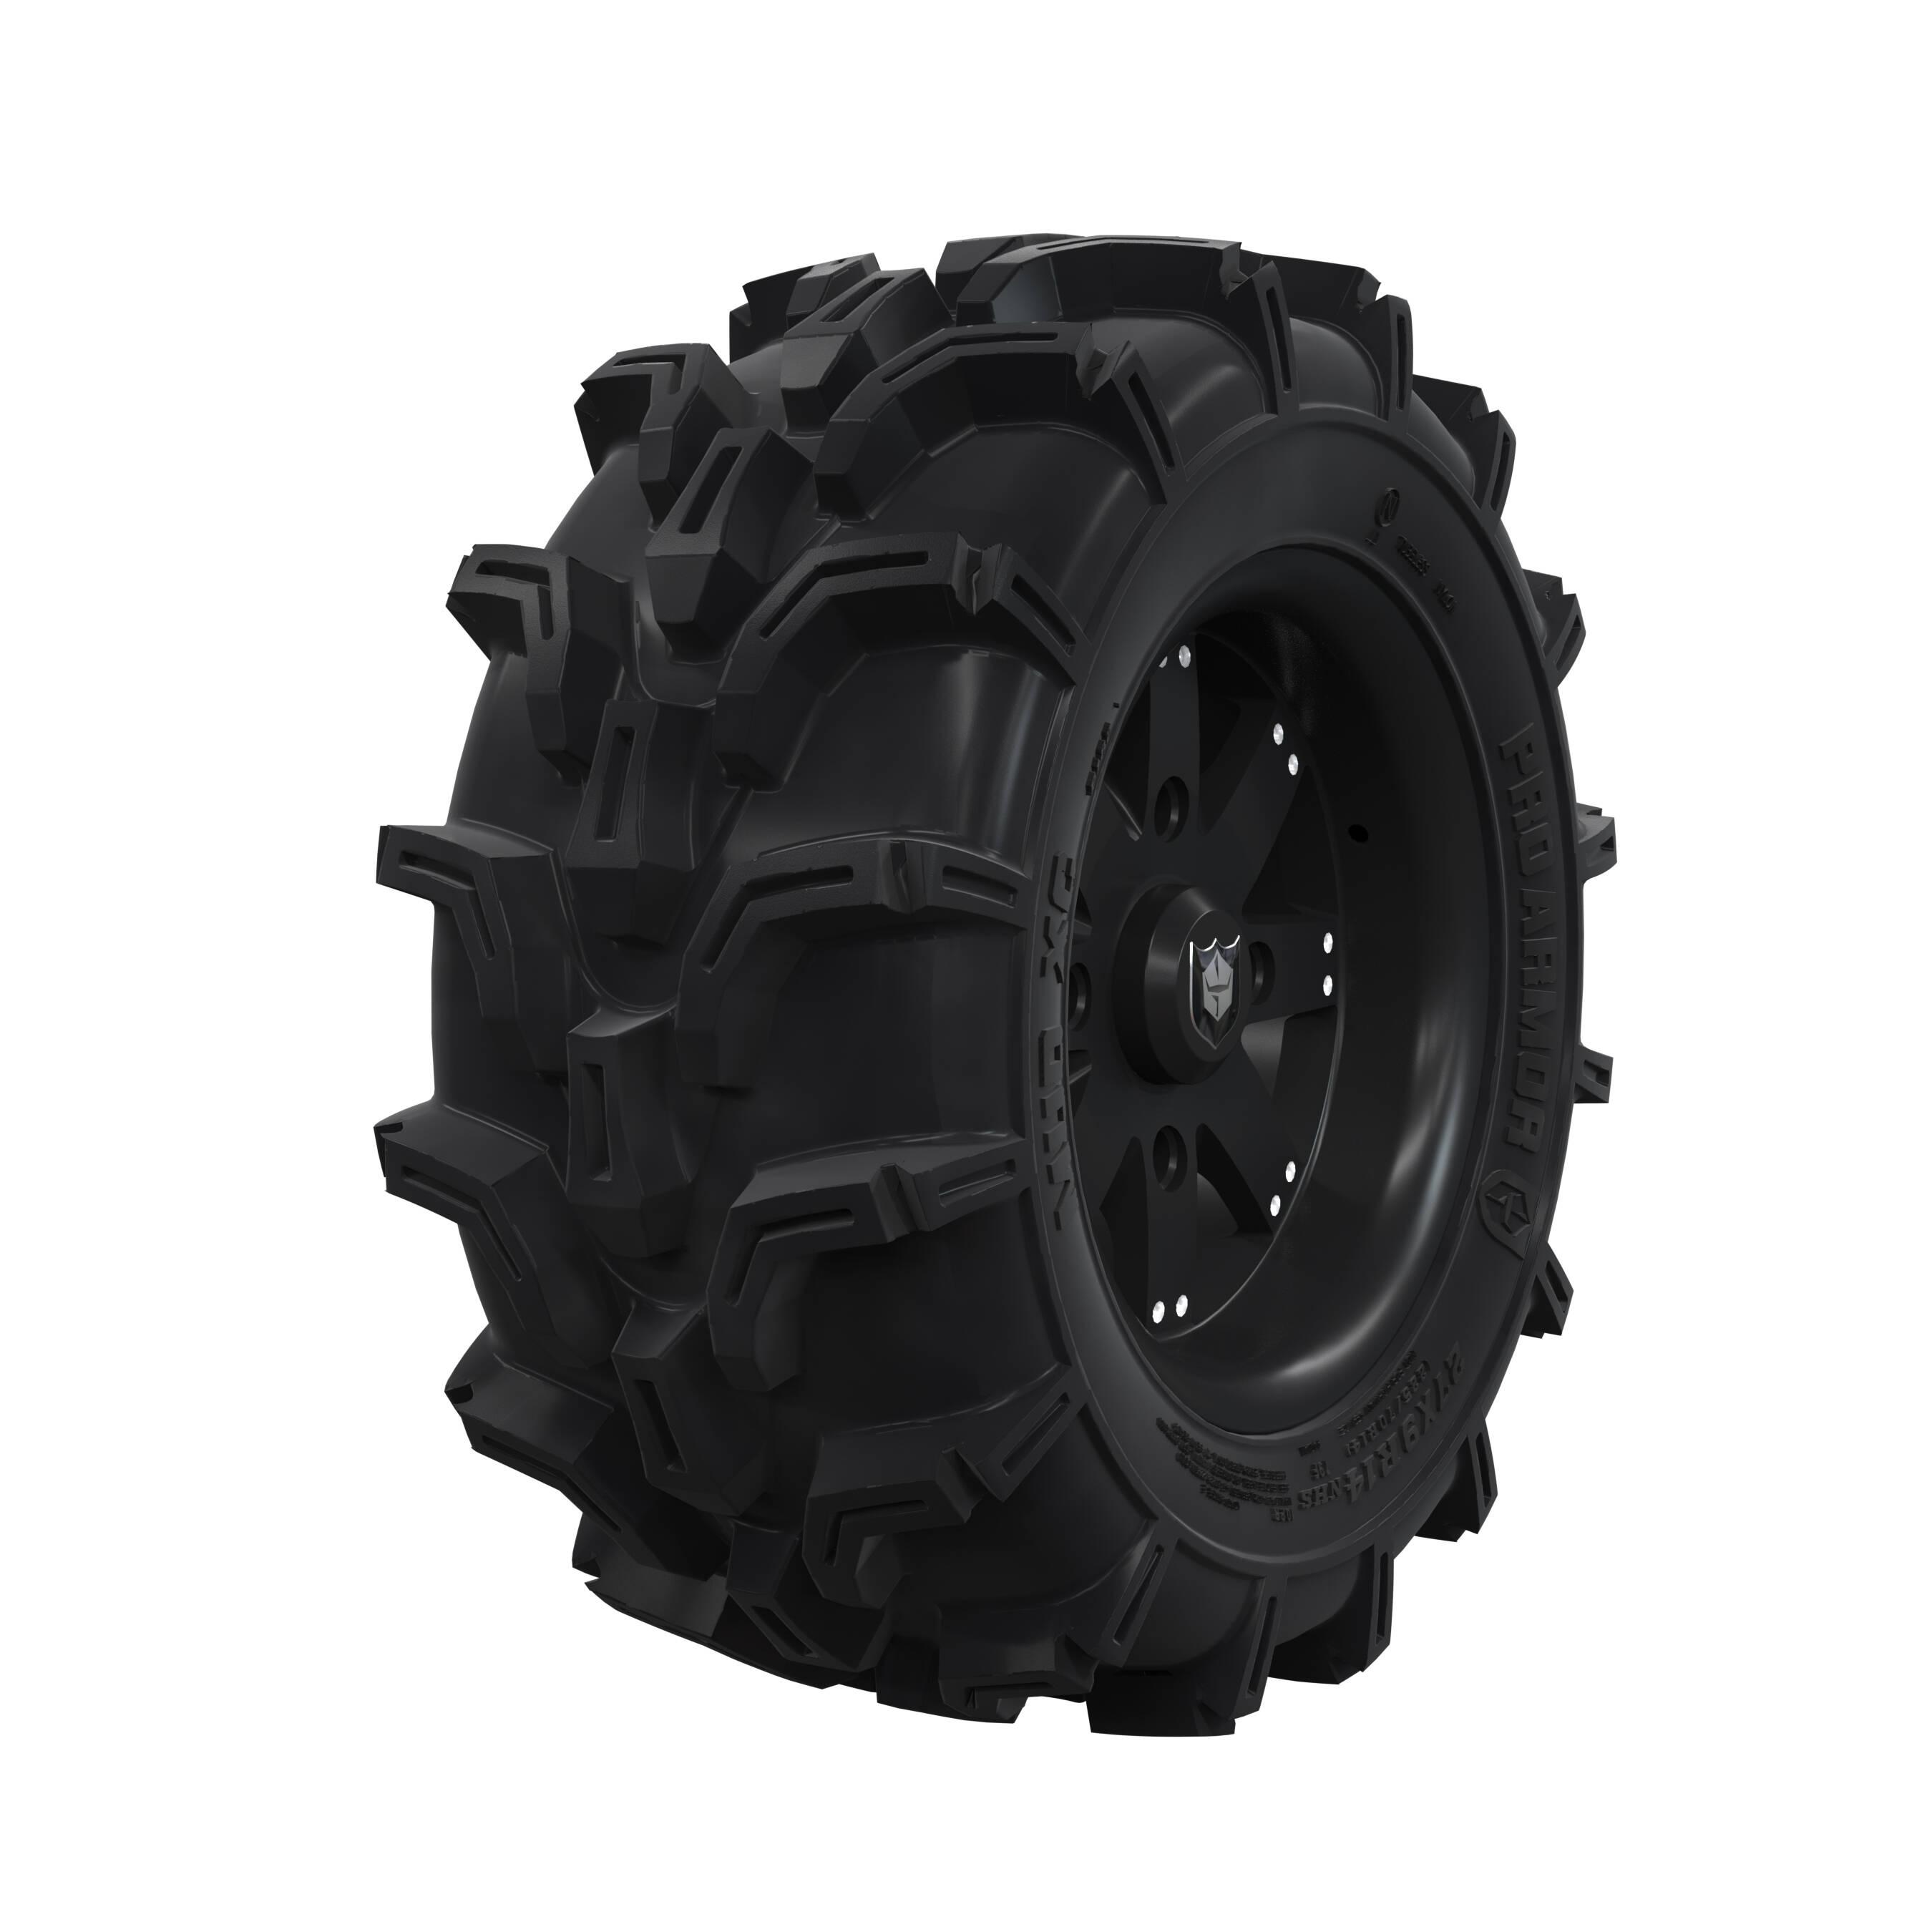 "Pro Amor® Wheel & Tire Set: Mud XC - Amplify - Matte Black - 27""R14"